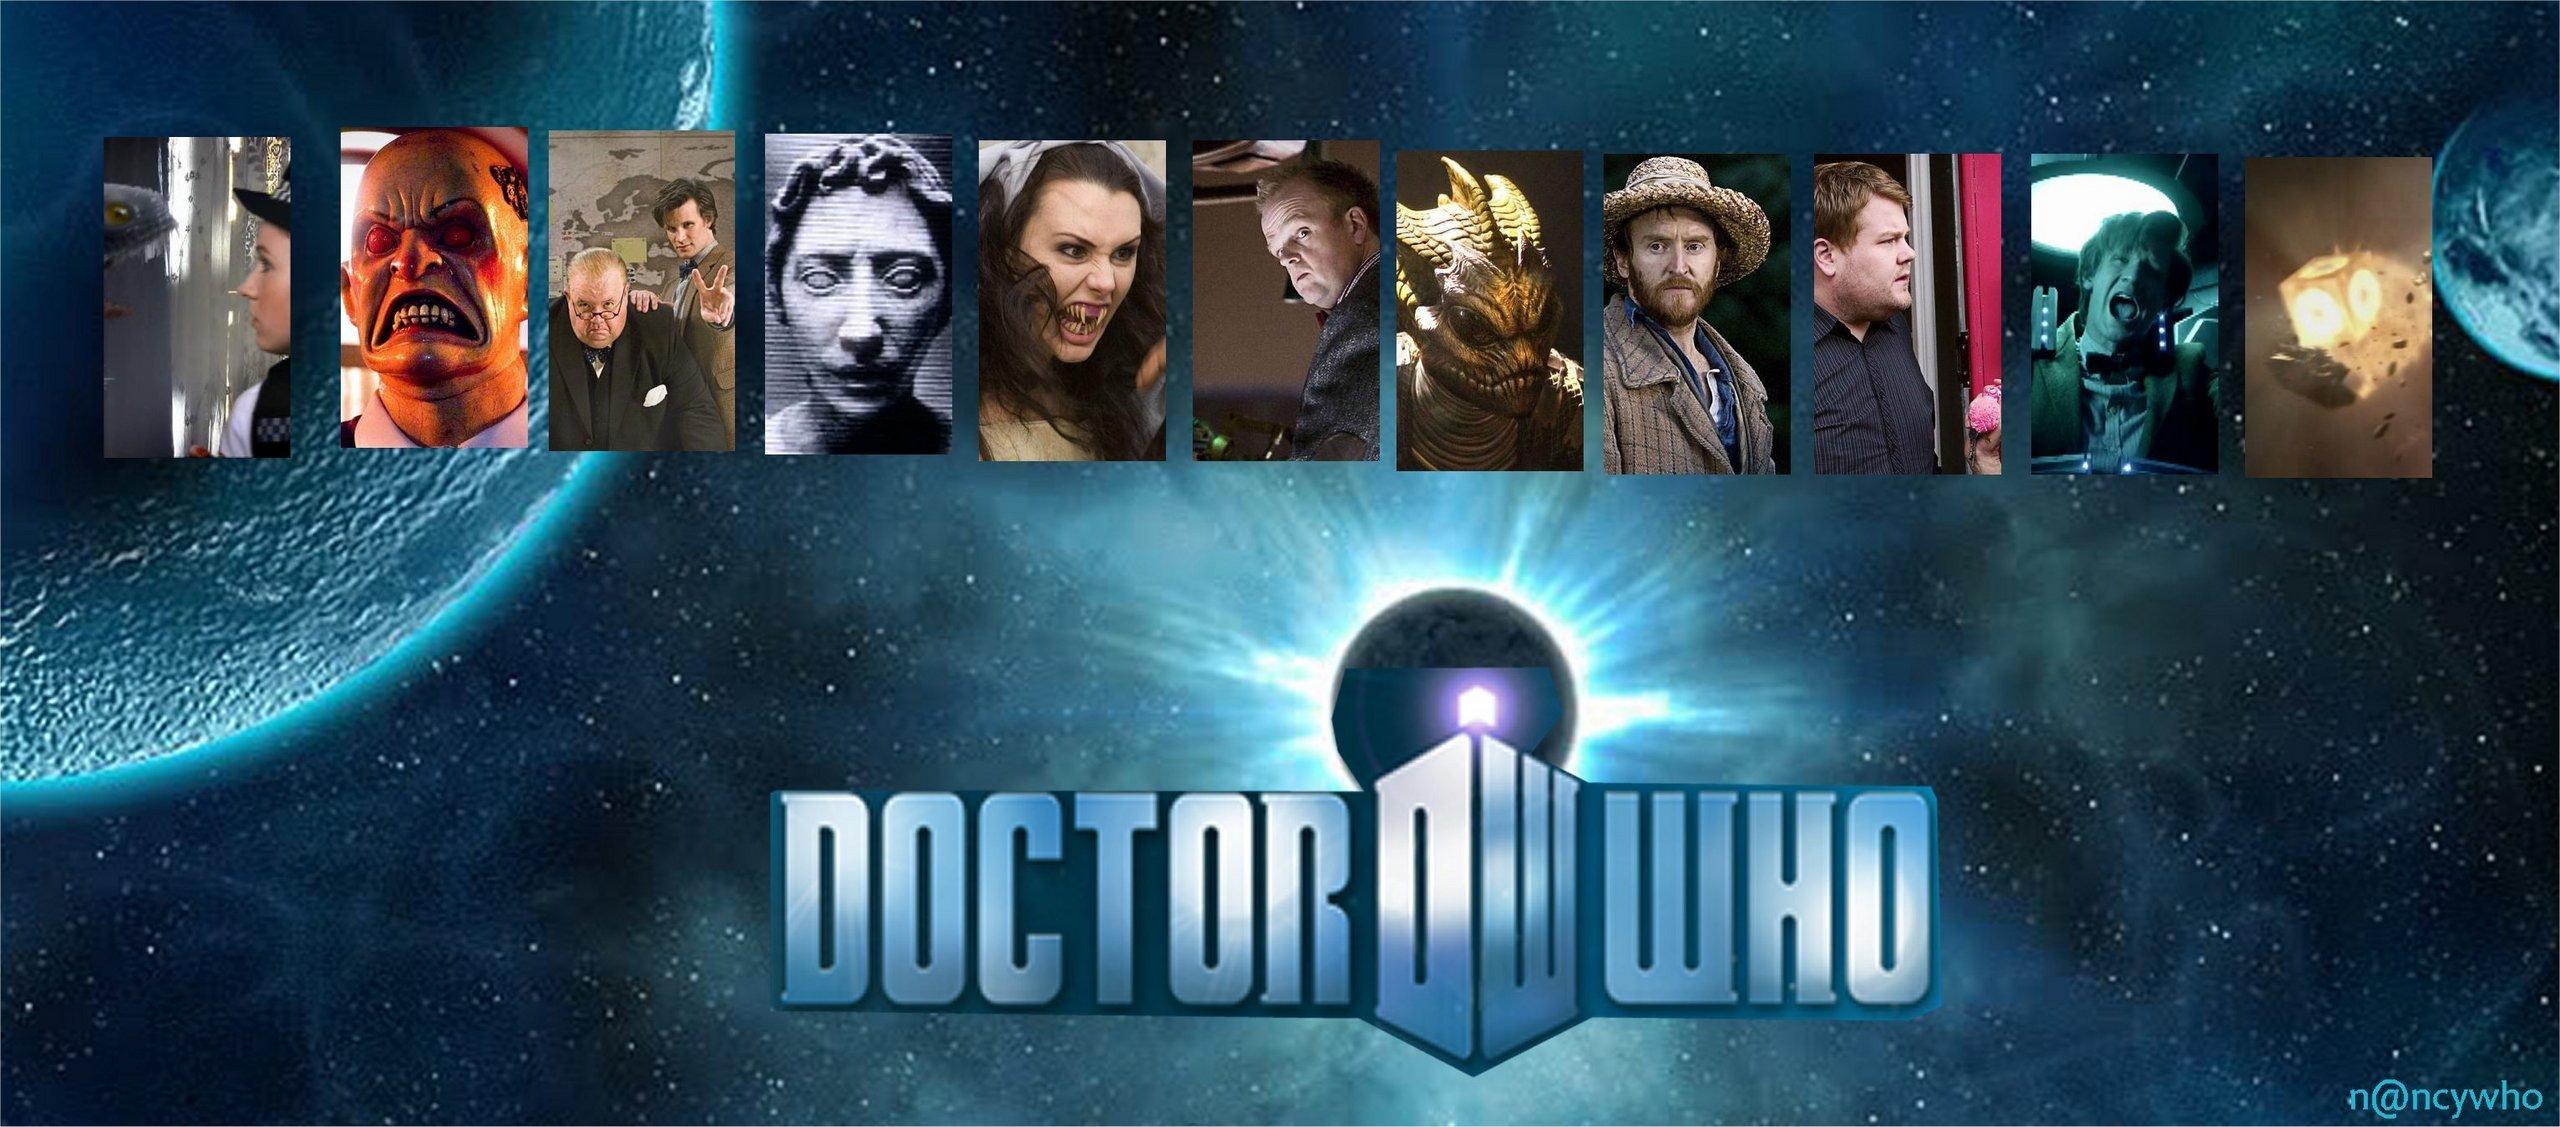 Doctor Who series 5 all eppyÞs